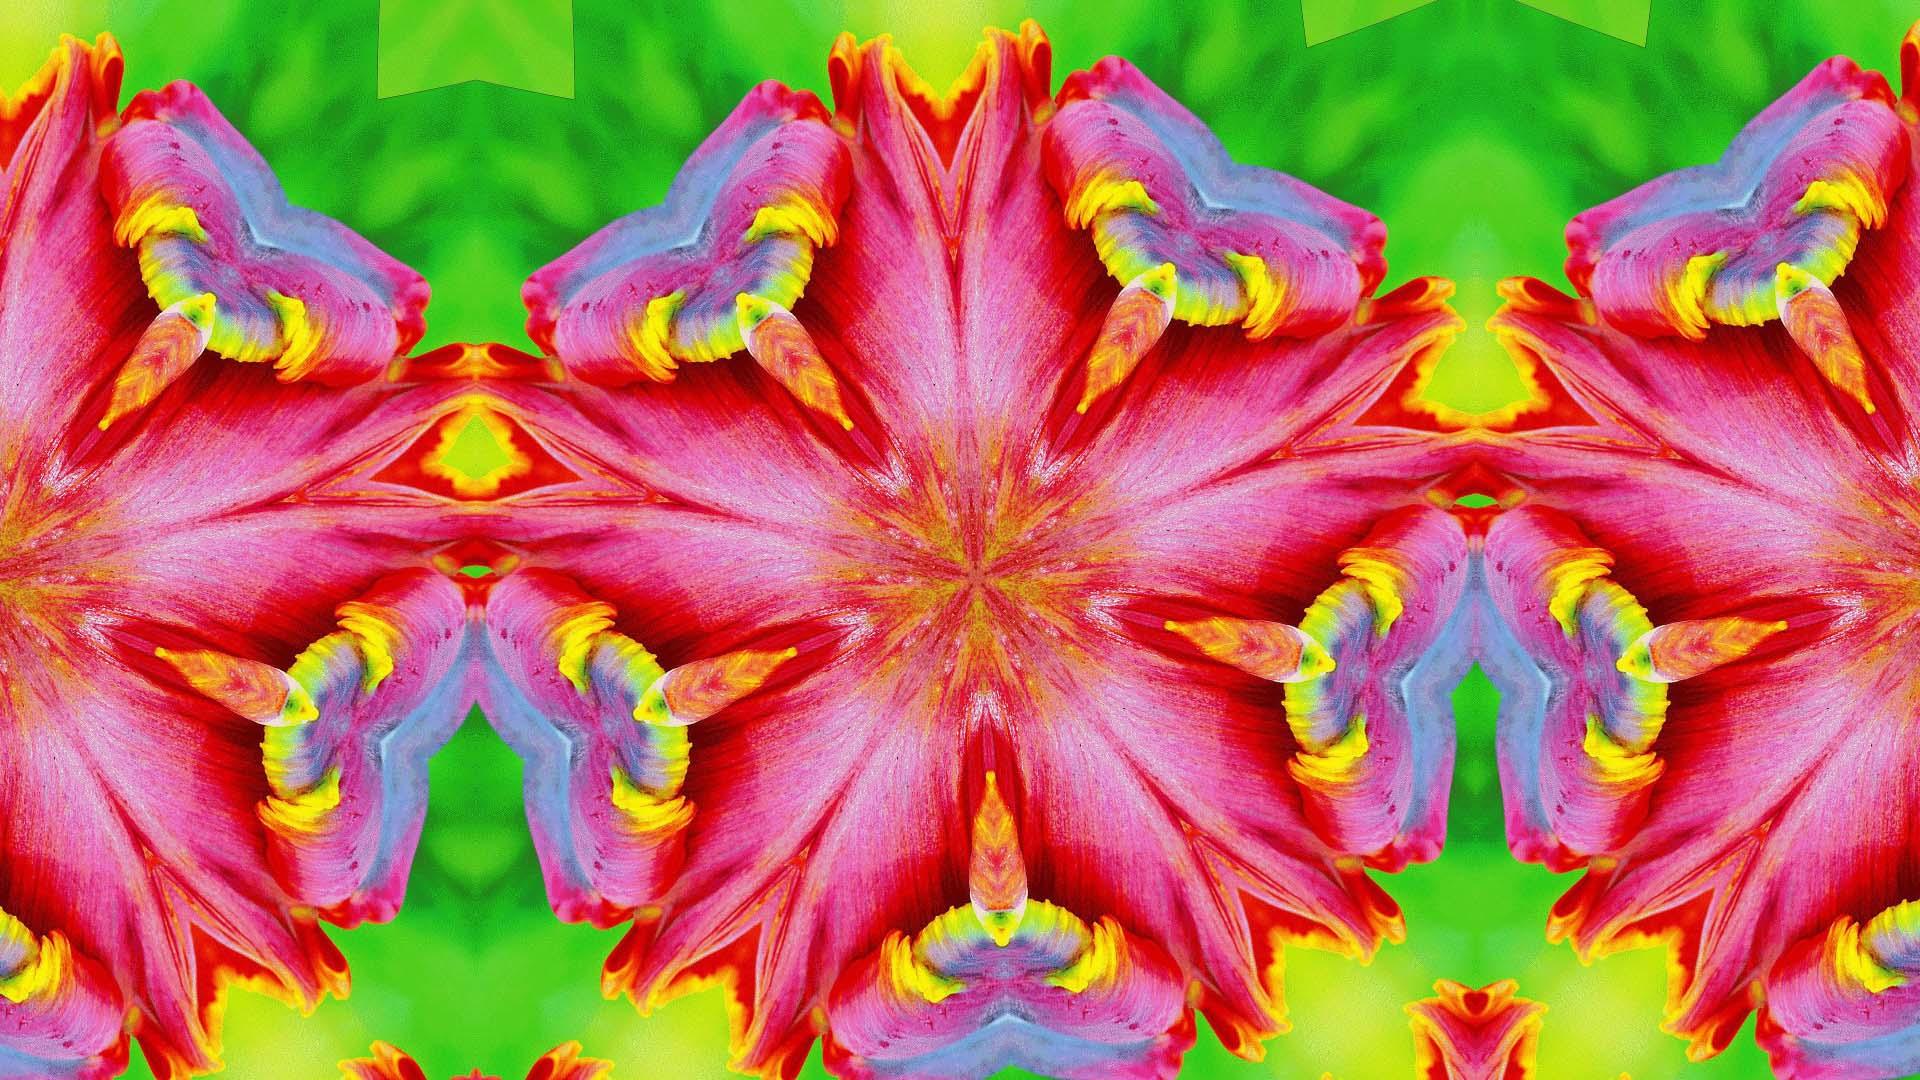 Artistic Digital Art Colors Pattern Pink Green 1920x1080